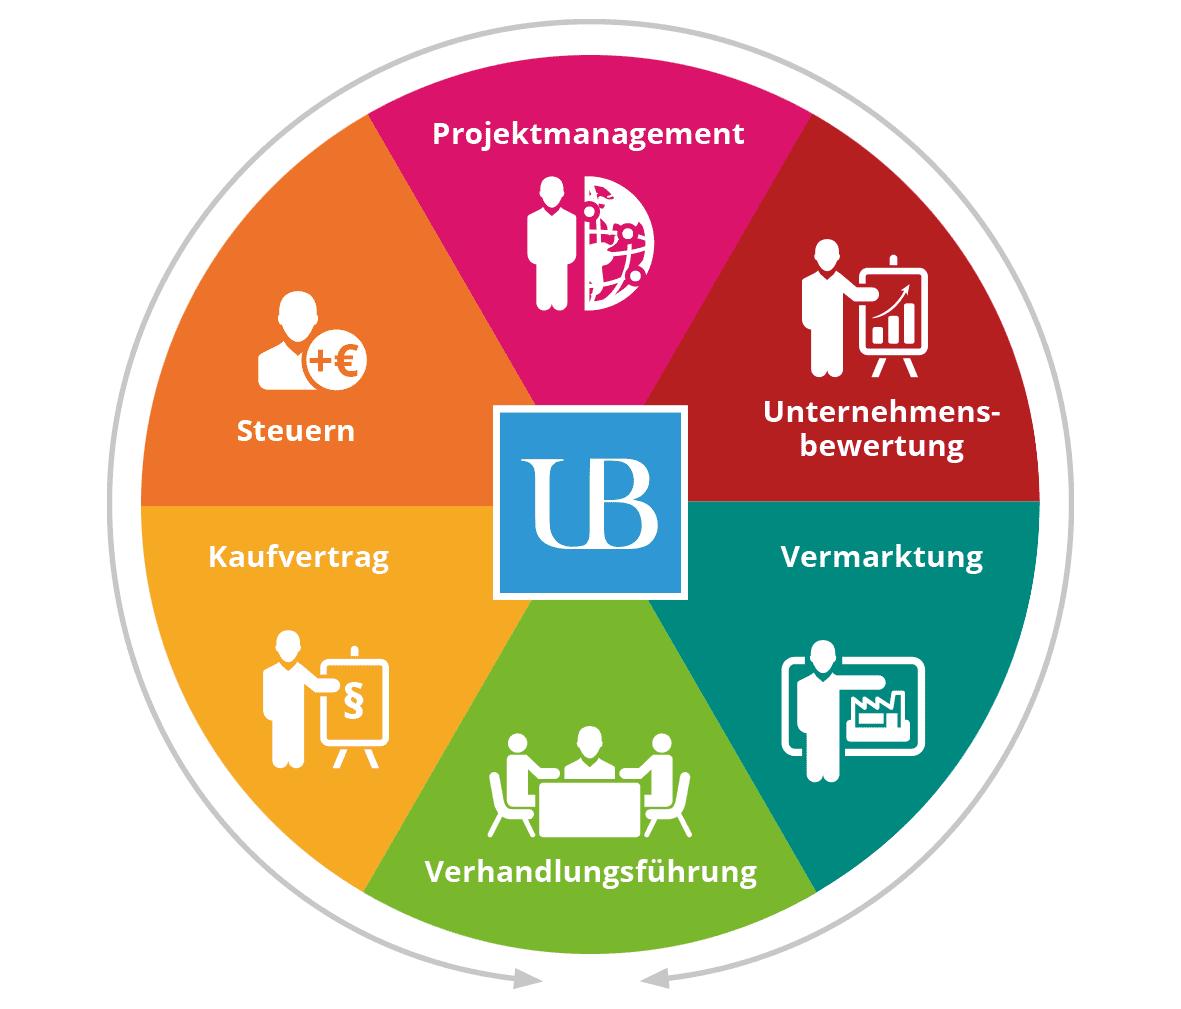 UB-Prozess